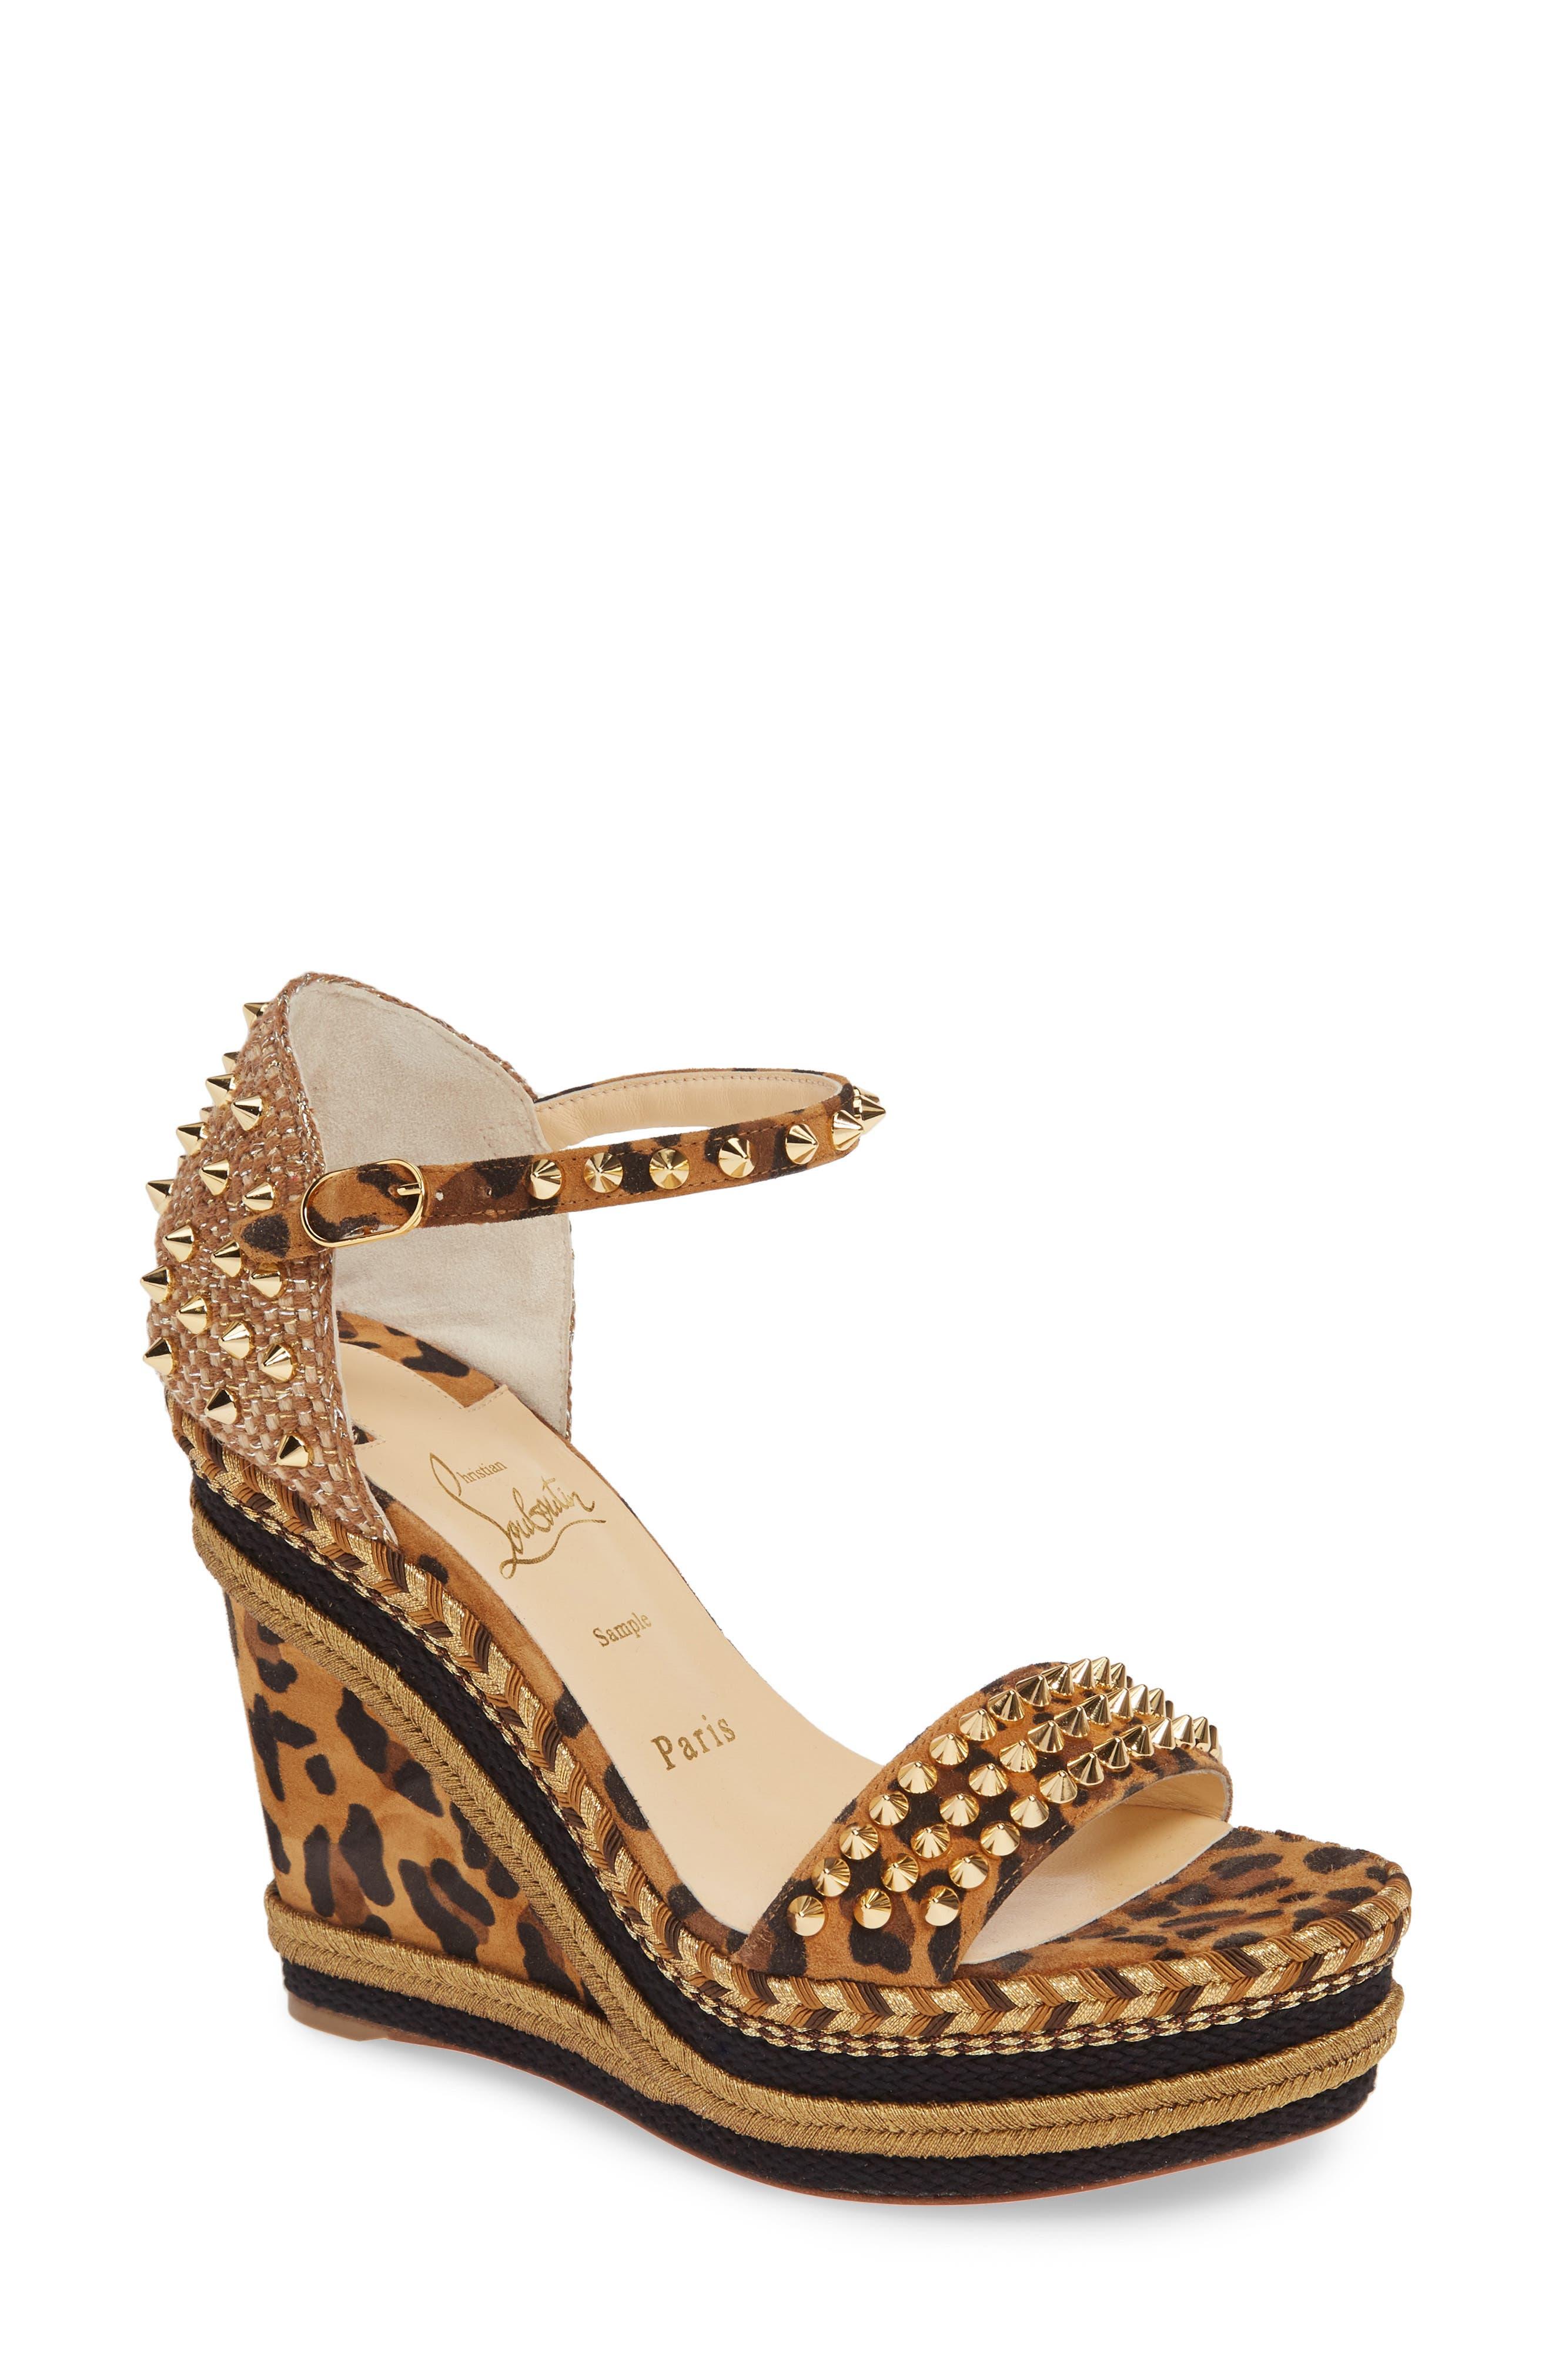 Christian Louboutin Madmonica Spike Wedge Sandal (Women)